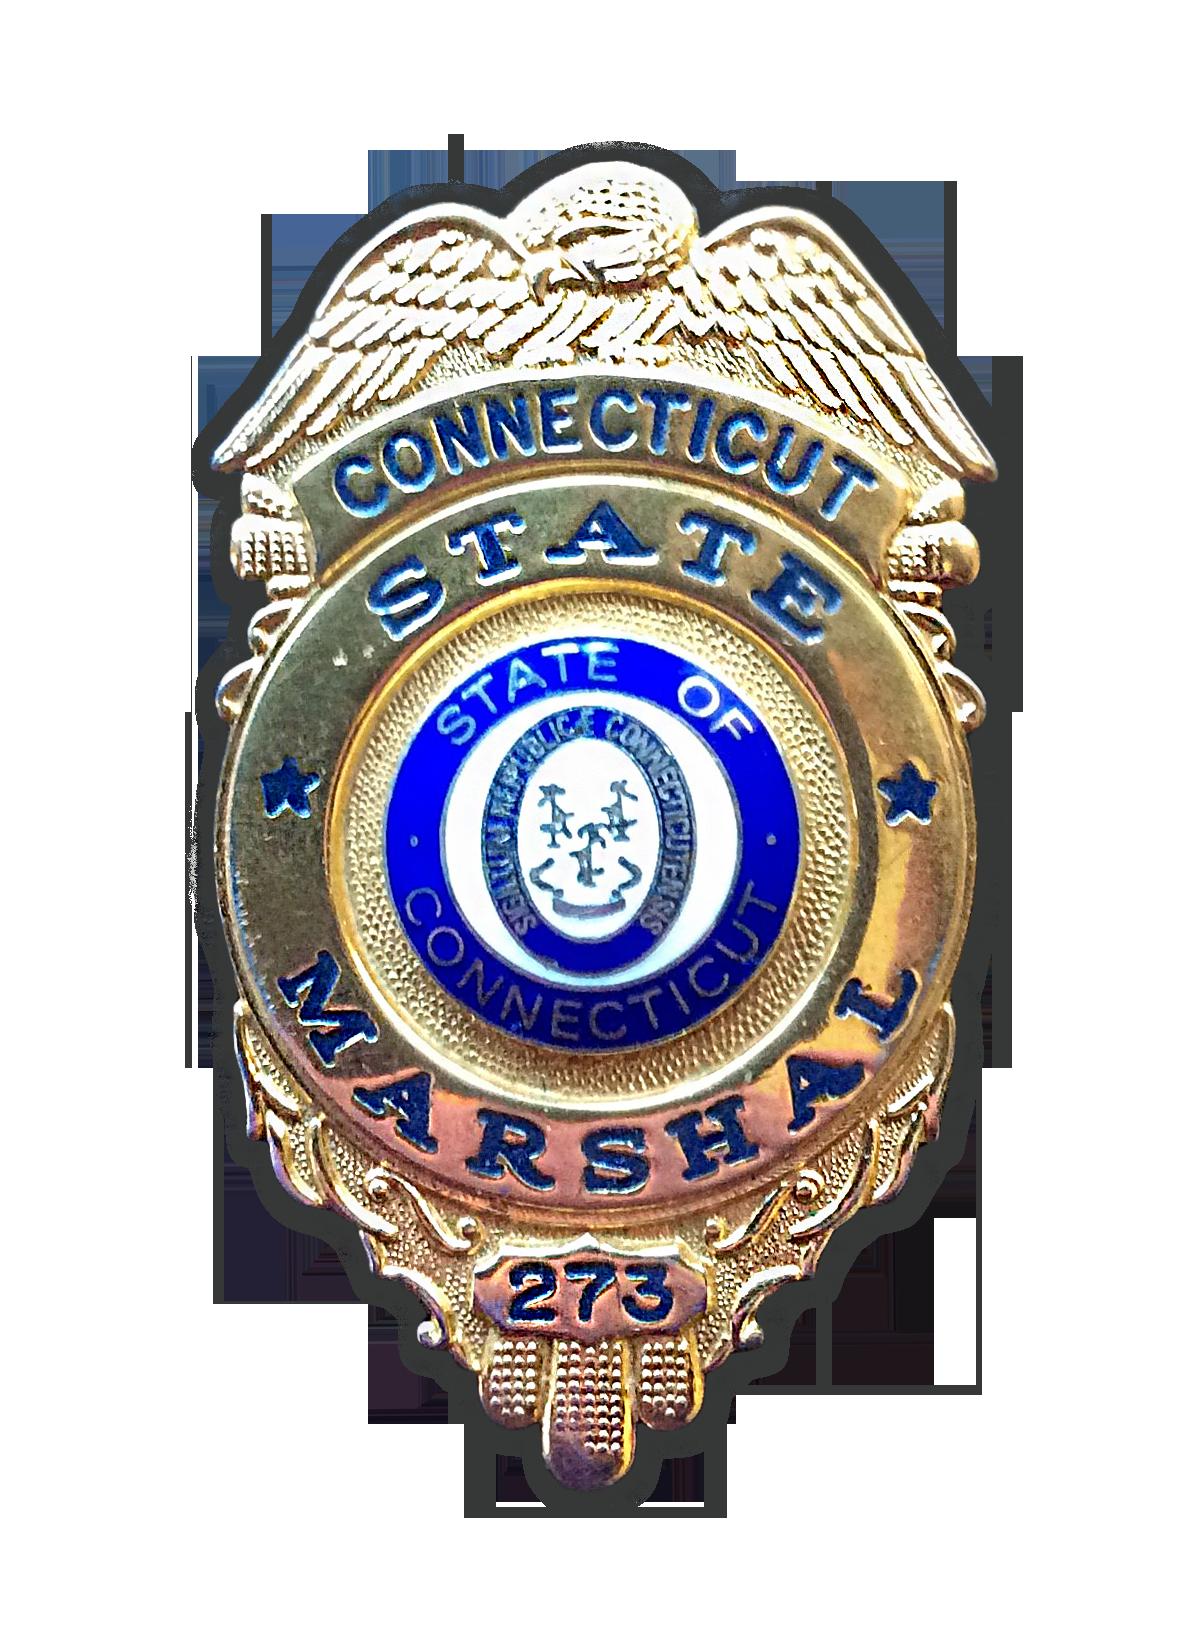 H. Mark DeAngelis CT Marshal Badge #273.png